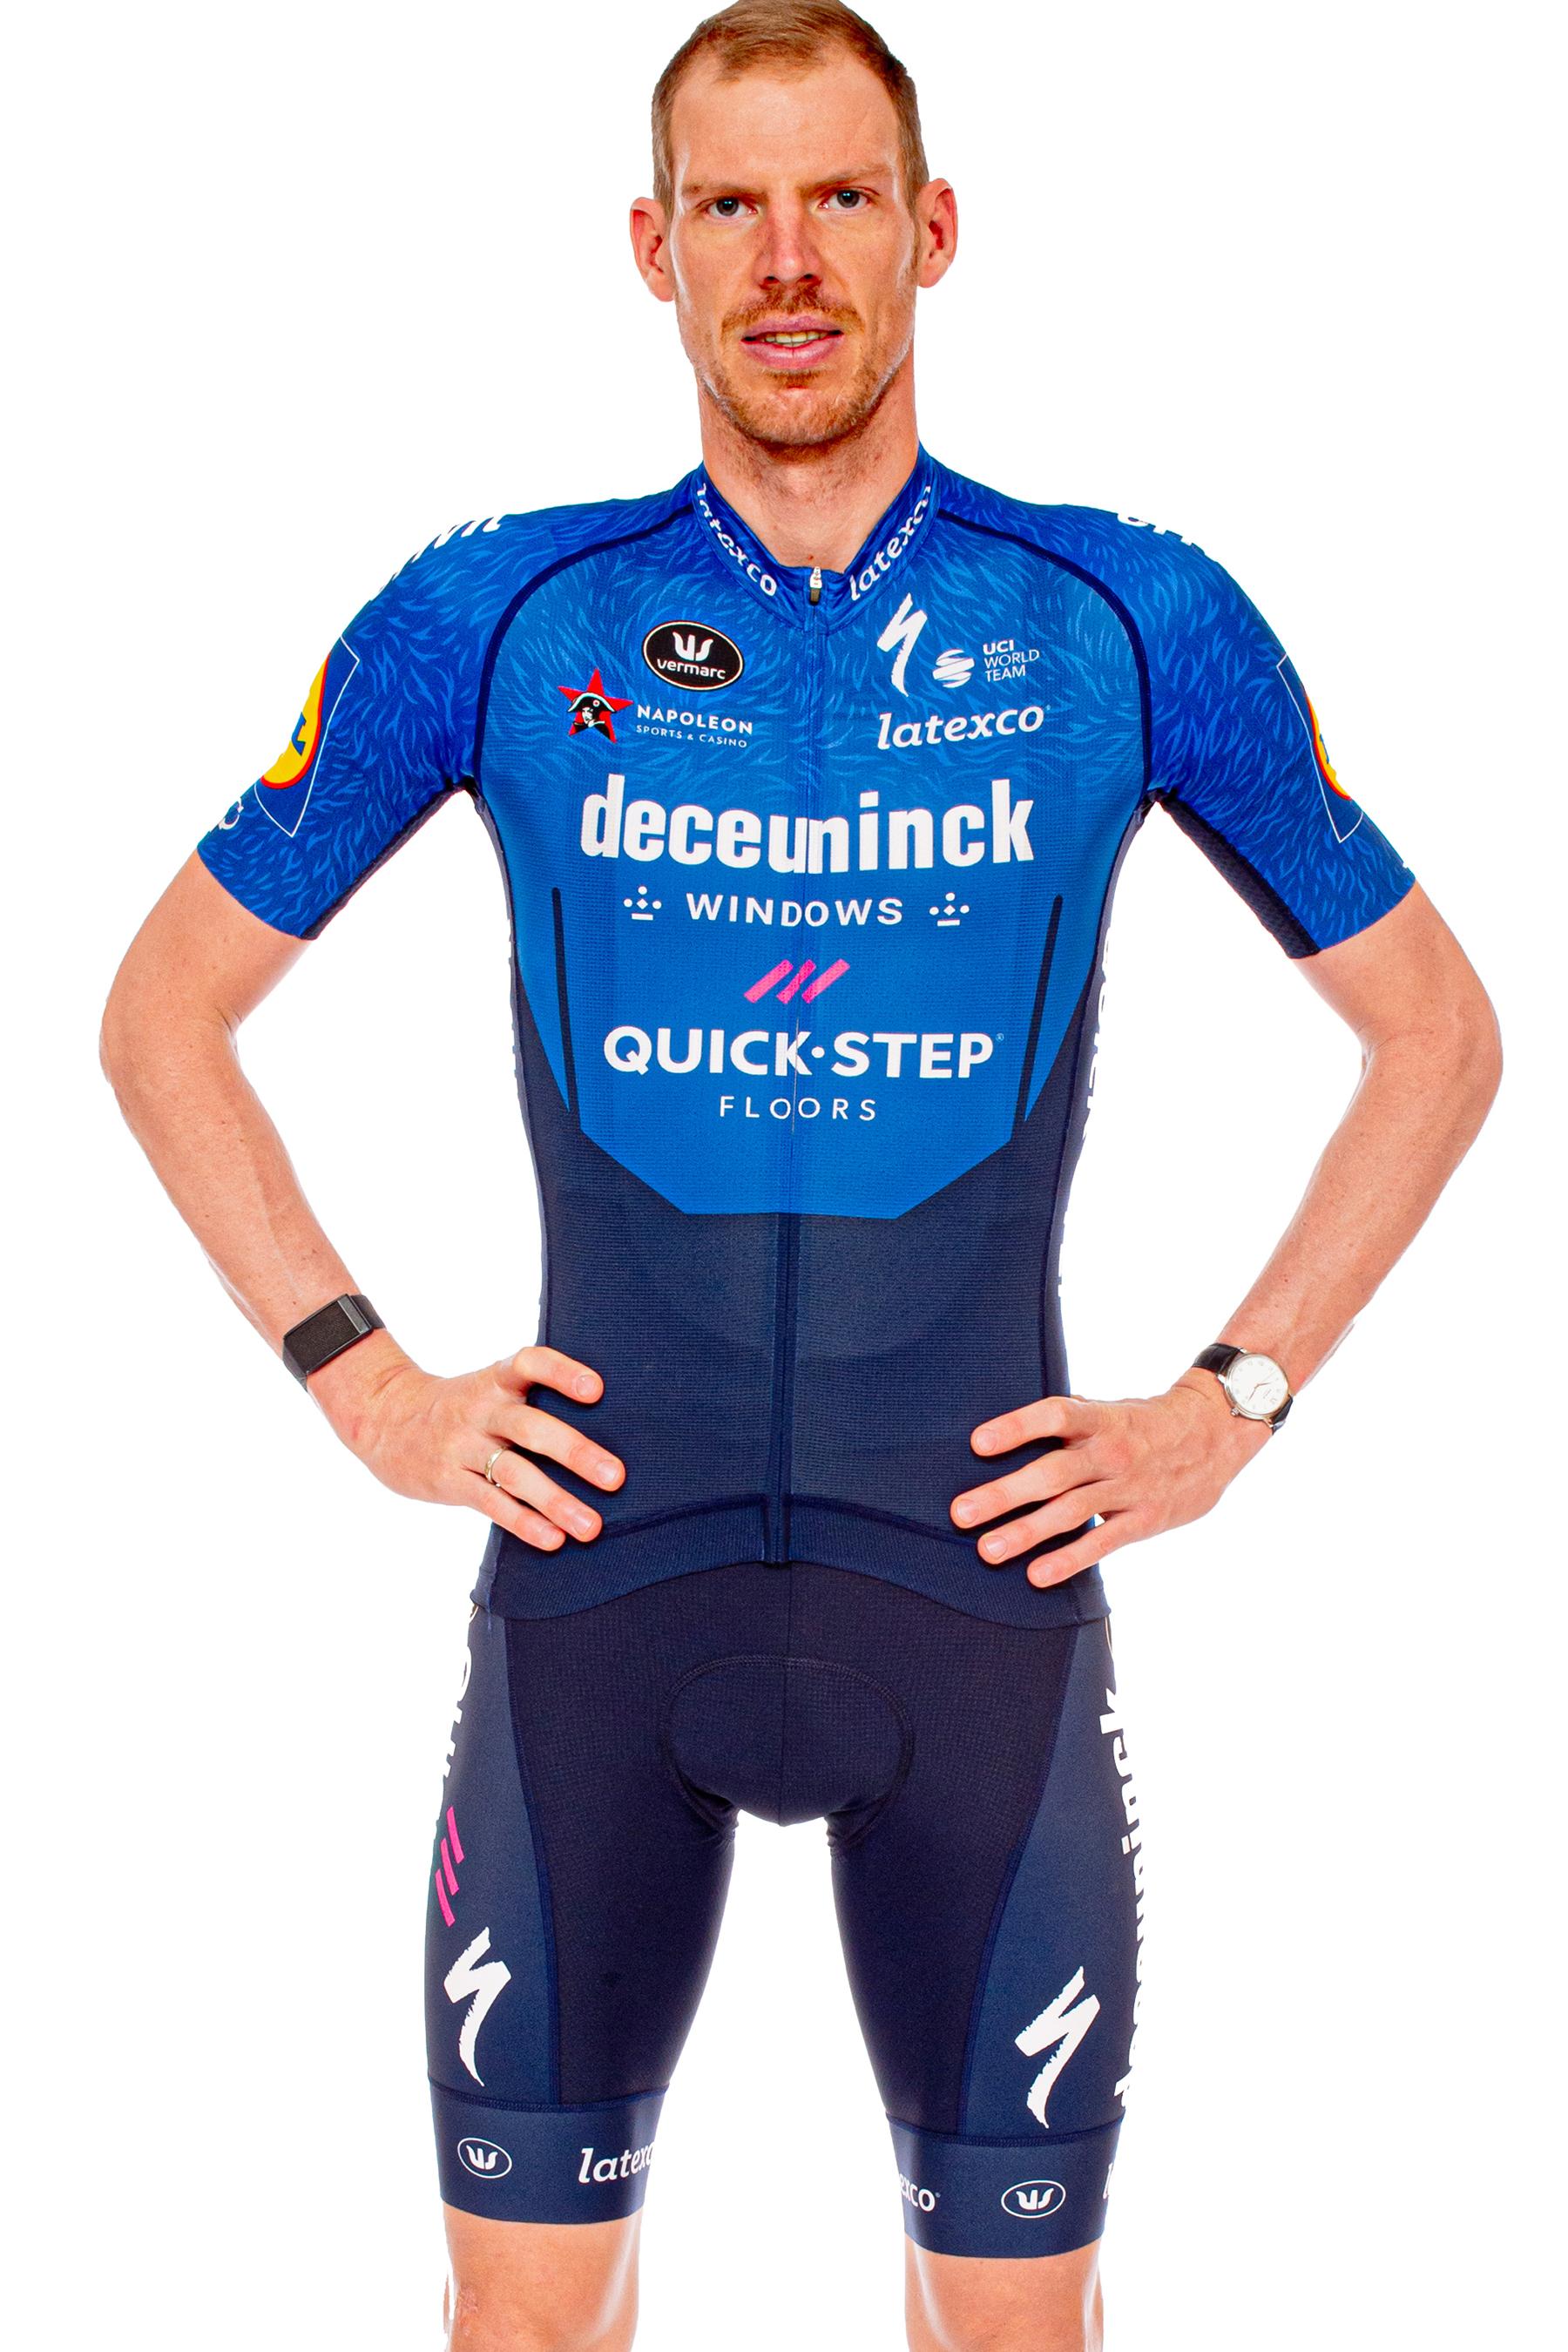 Tim Declercq Deceuninck 2021